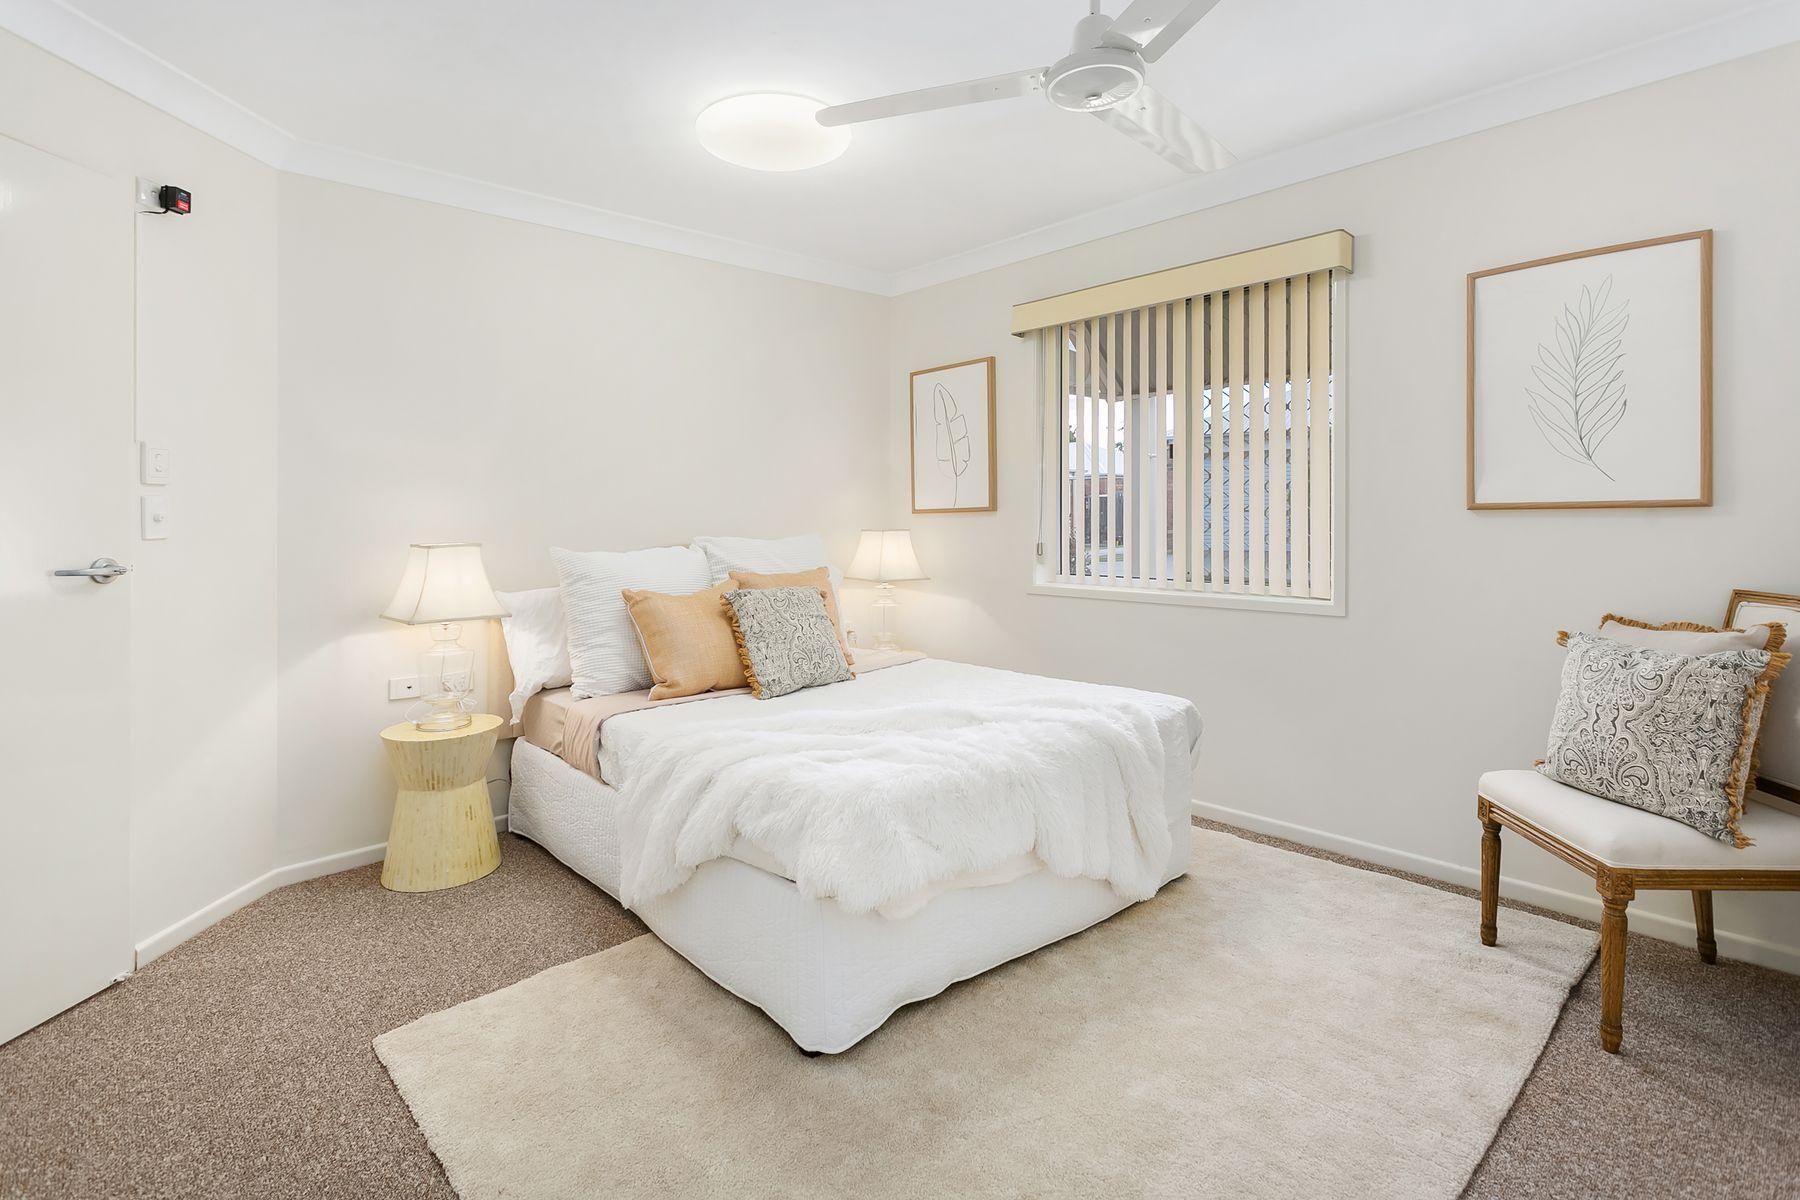 59 John Street, Rosewood, QLD 4340